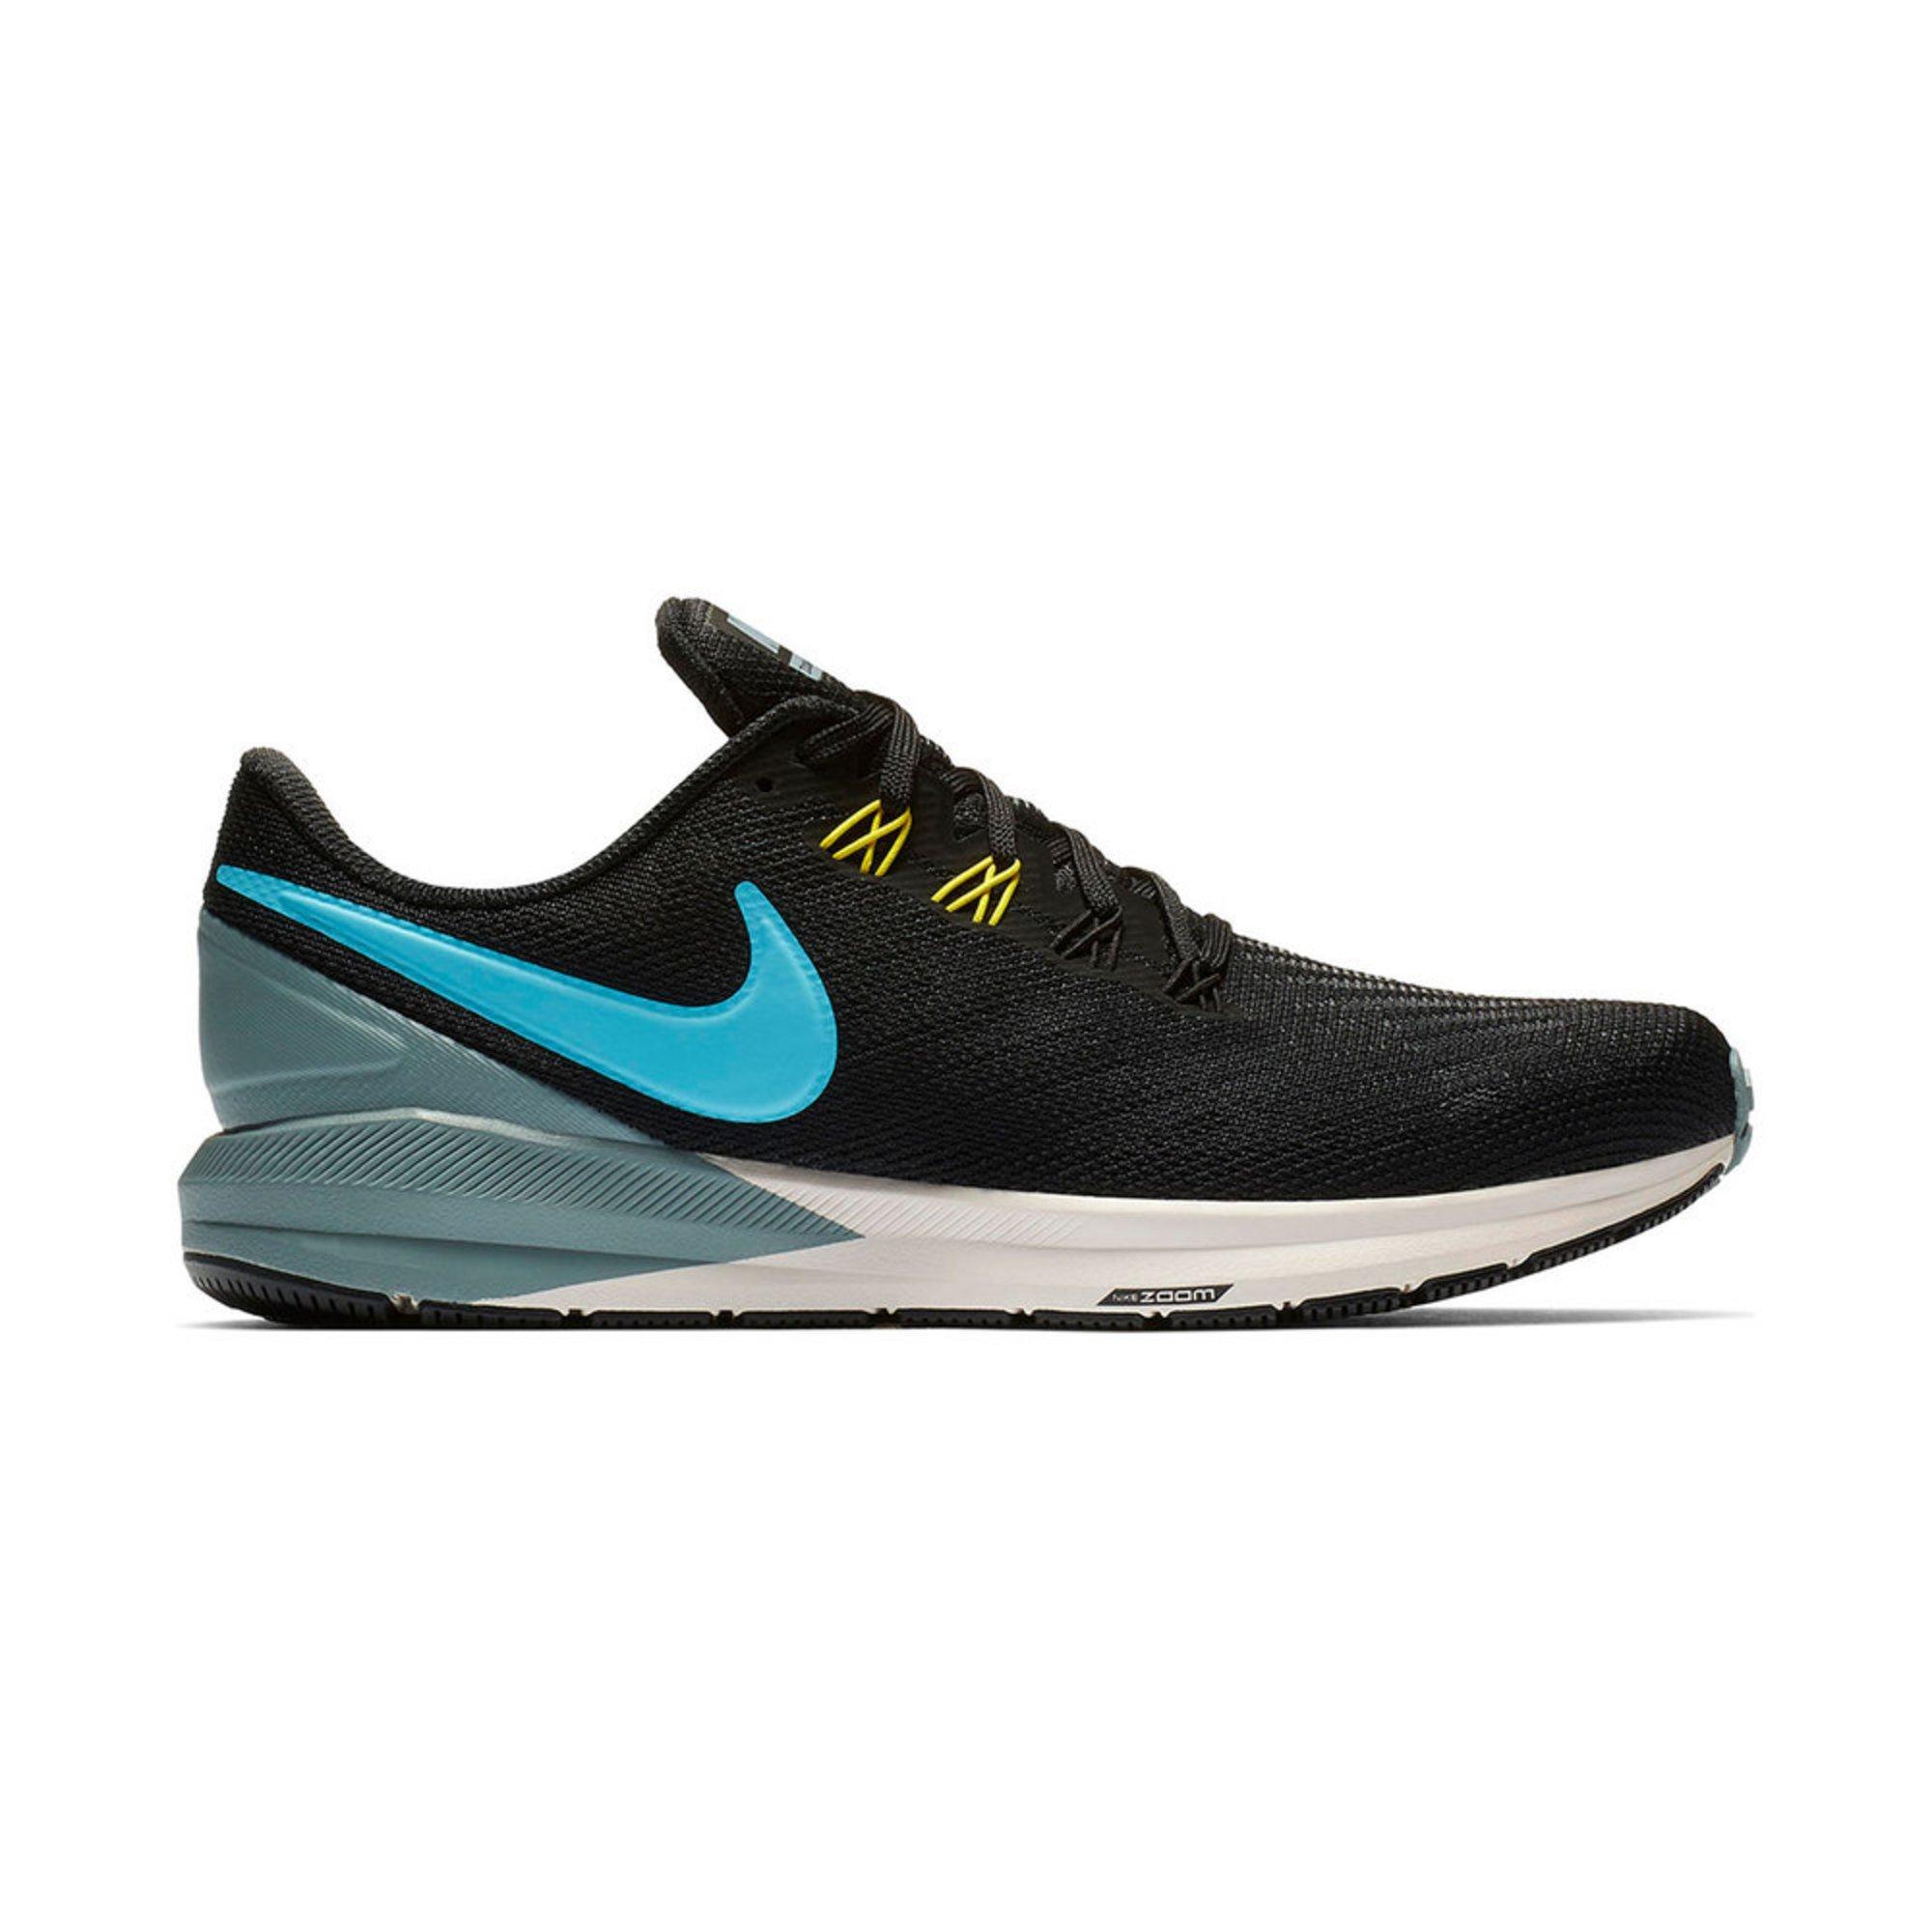 e4eb7c3a56ccf Nike. Nike Men s Air Zoom Structure 22 Running Shoe